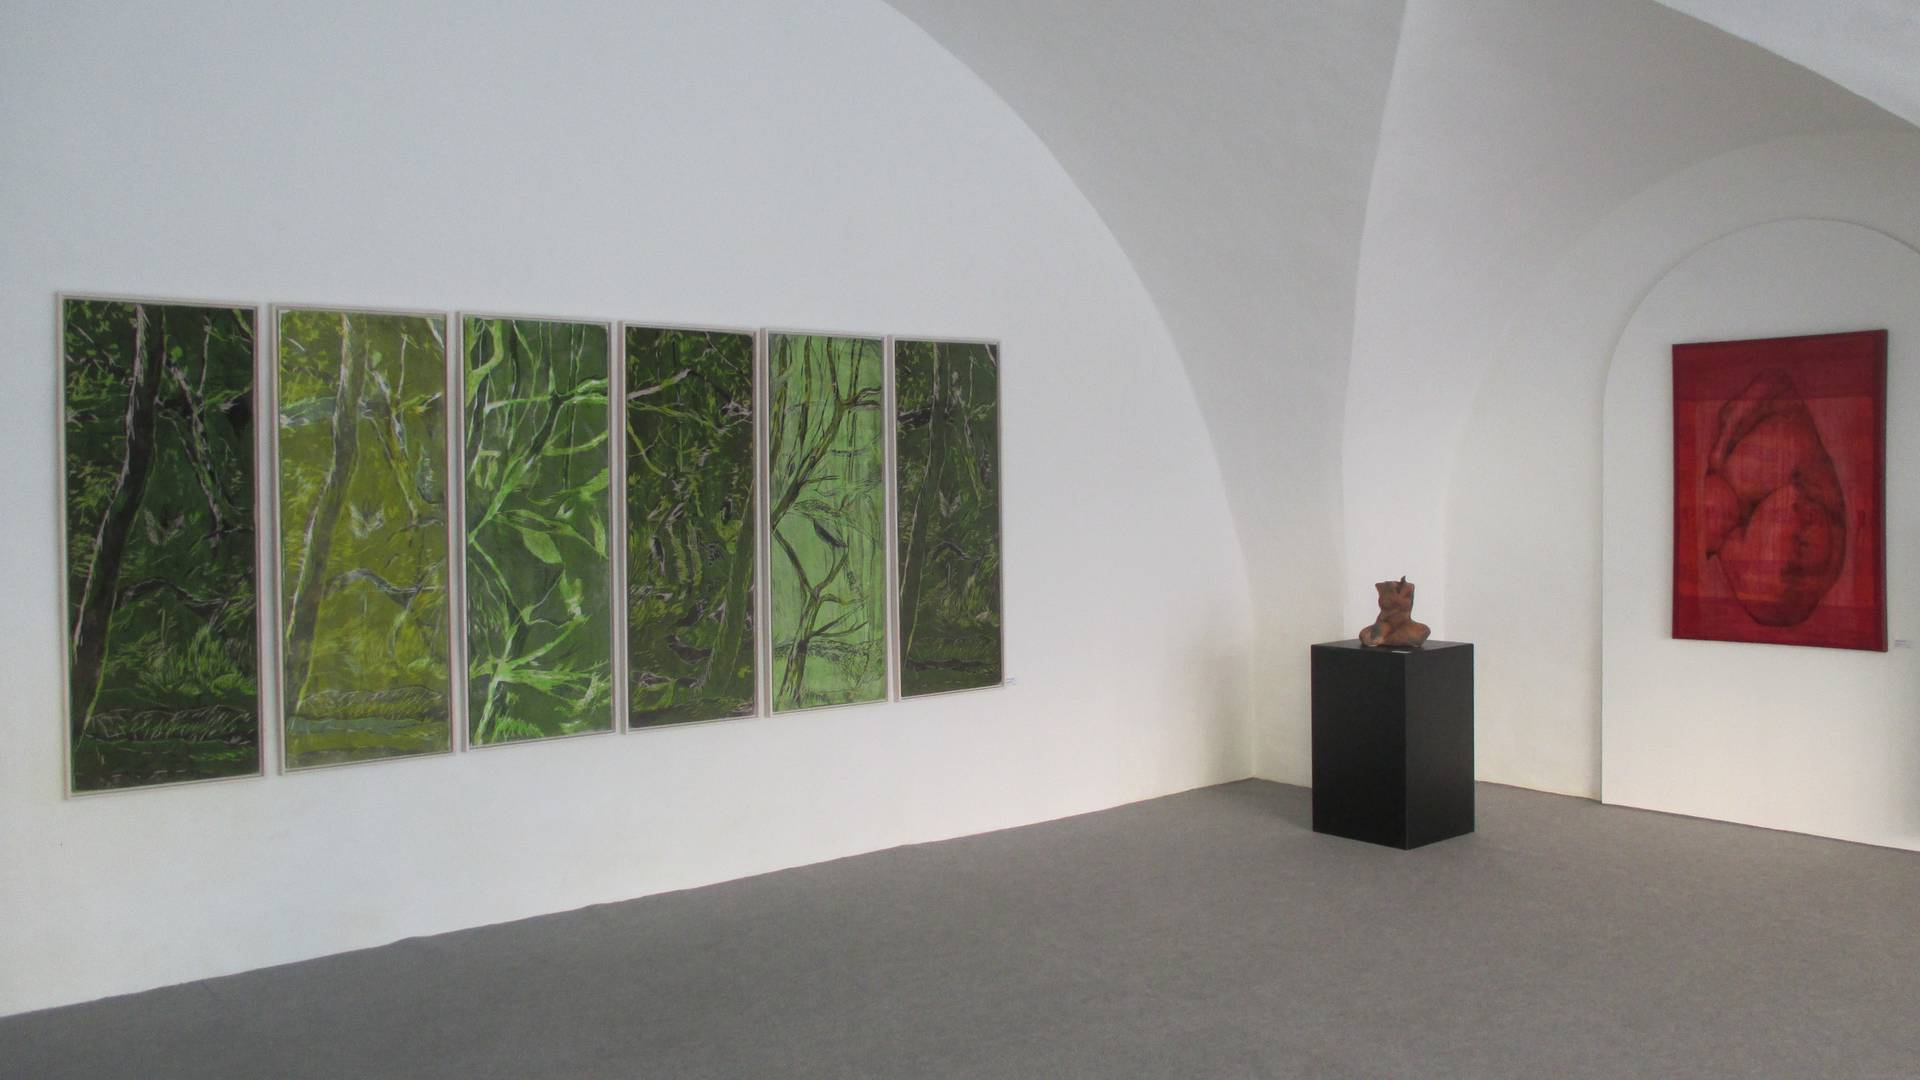 Galerie II Stadtgemeinde St. Andrae